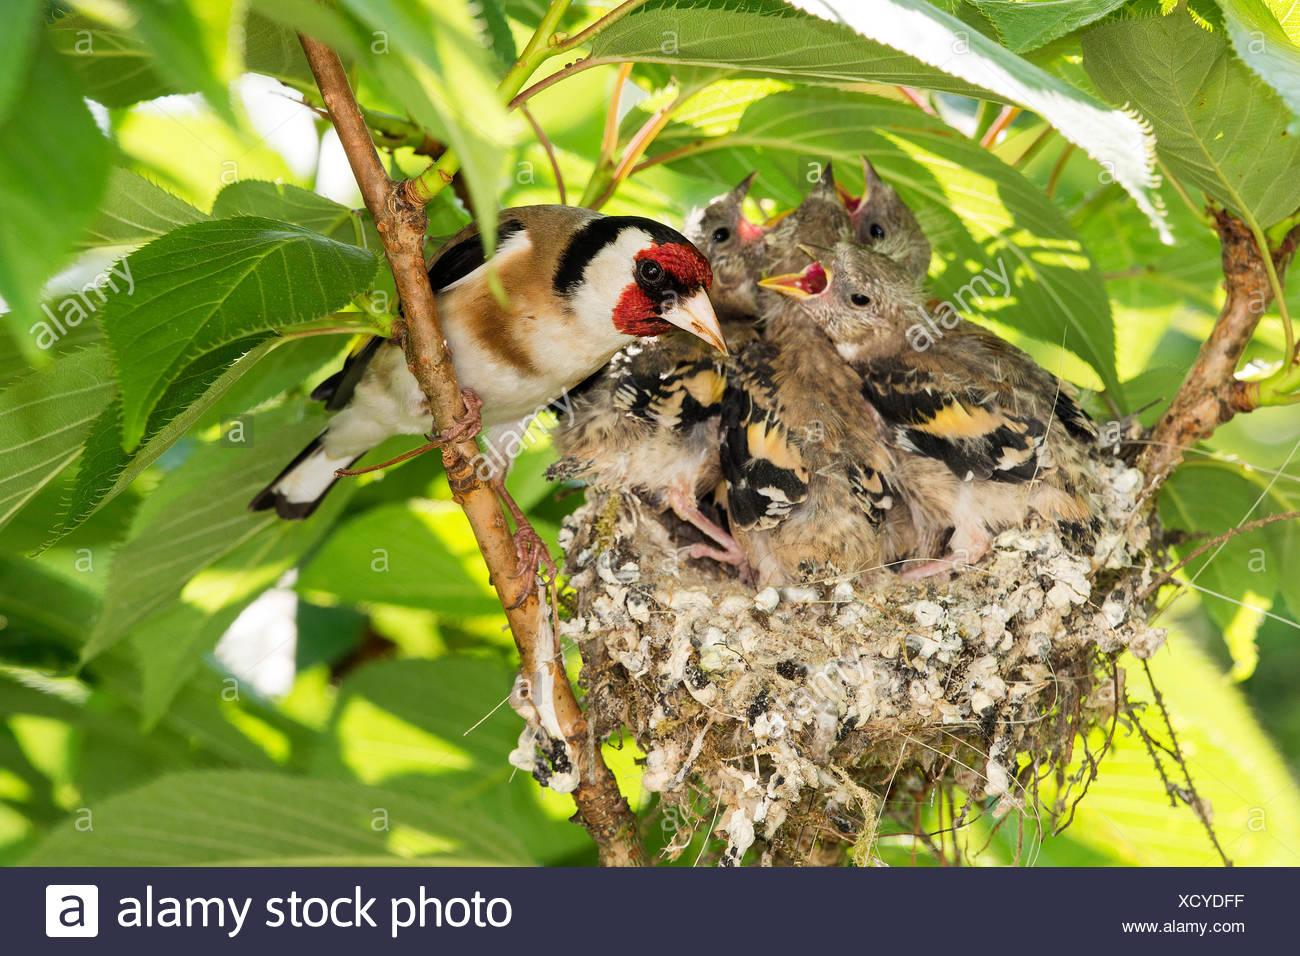 Stieglitz, Distelfink (Carduelis carduelis), am nido mit Jungen flueggen  rápido, Deutschland, NRW | Eurasiática jilguero (Carduelis